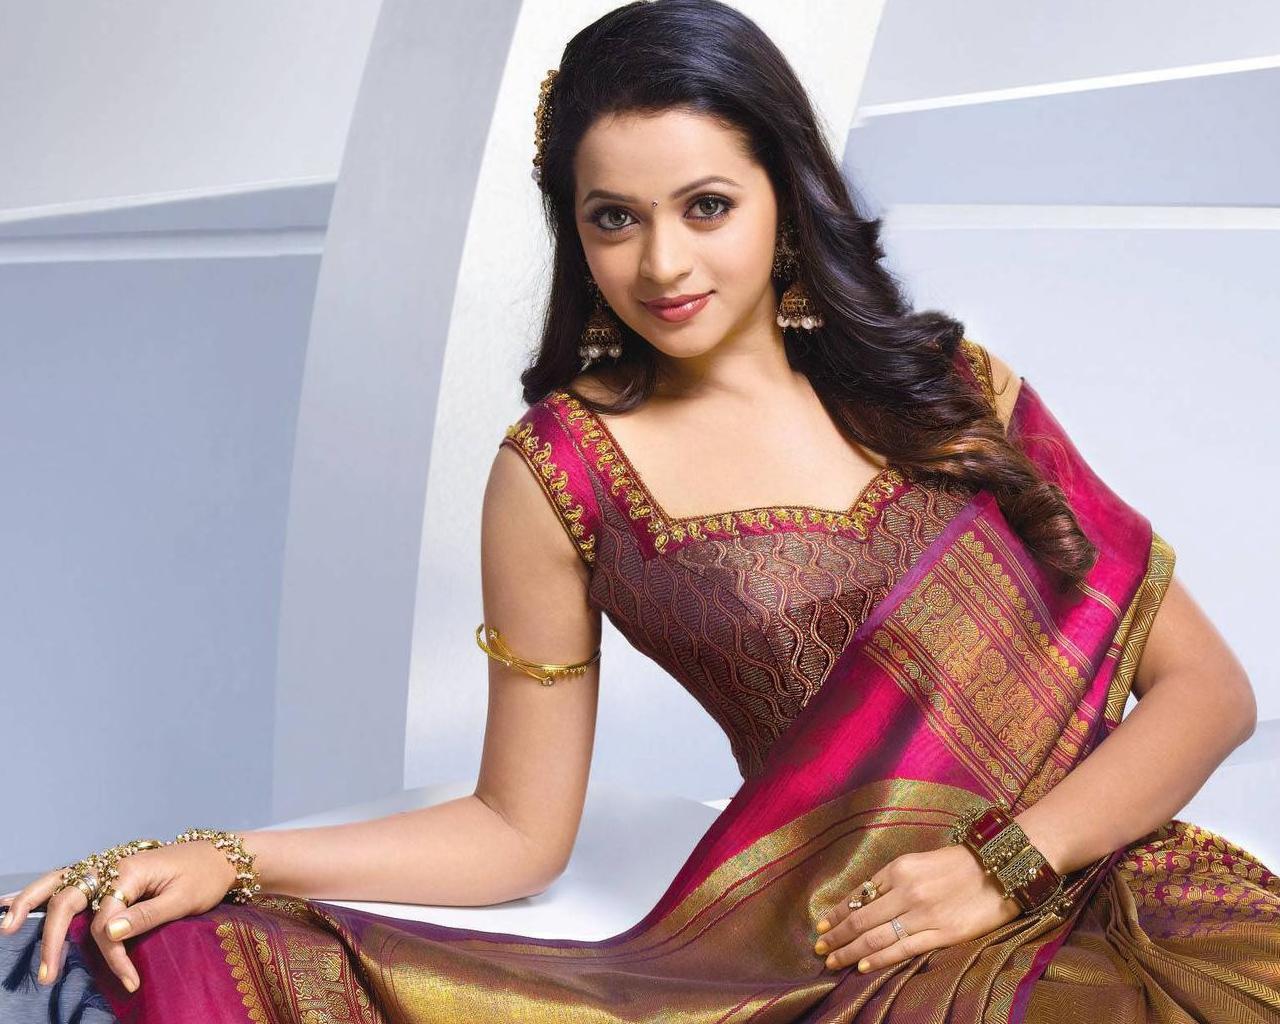 Beautiful Actress Bhavana Wallpapers HD Wallpapers 1280x1024